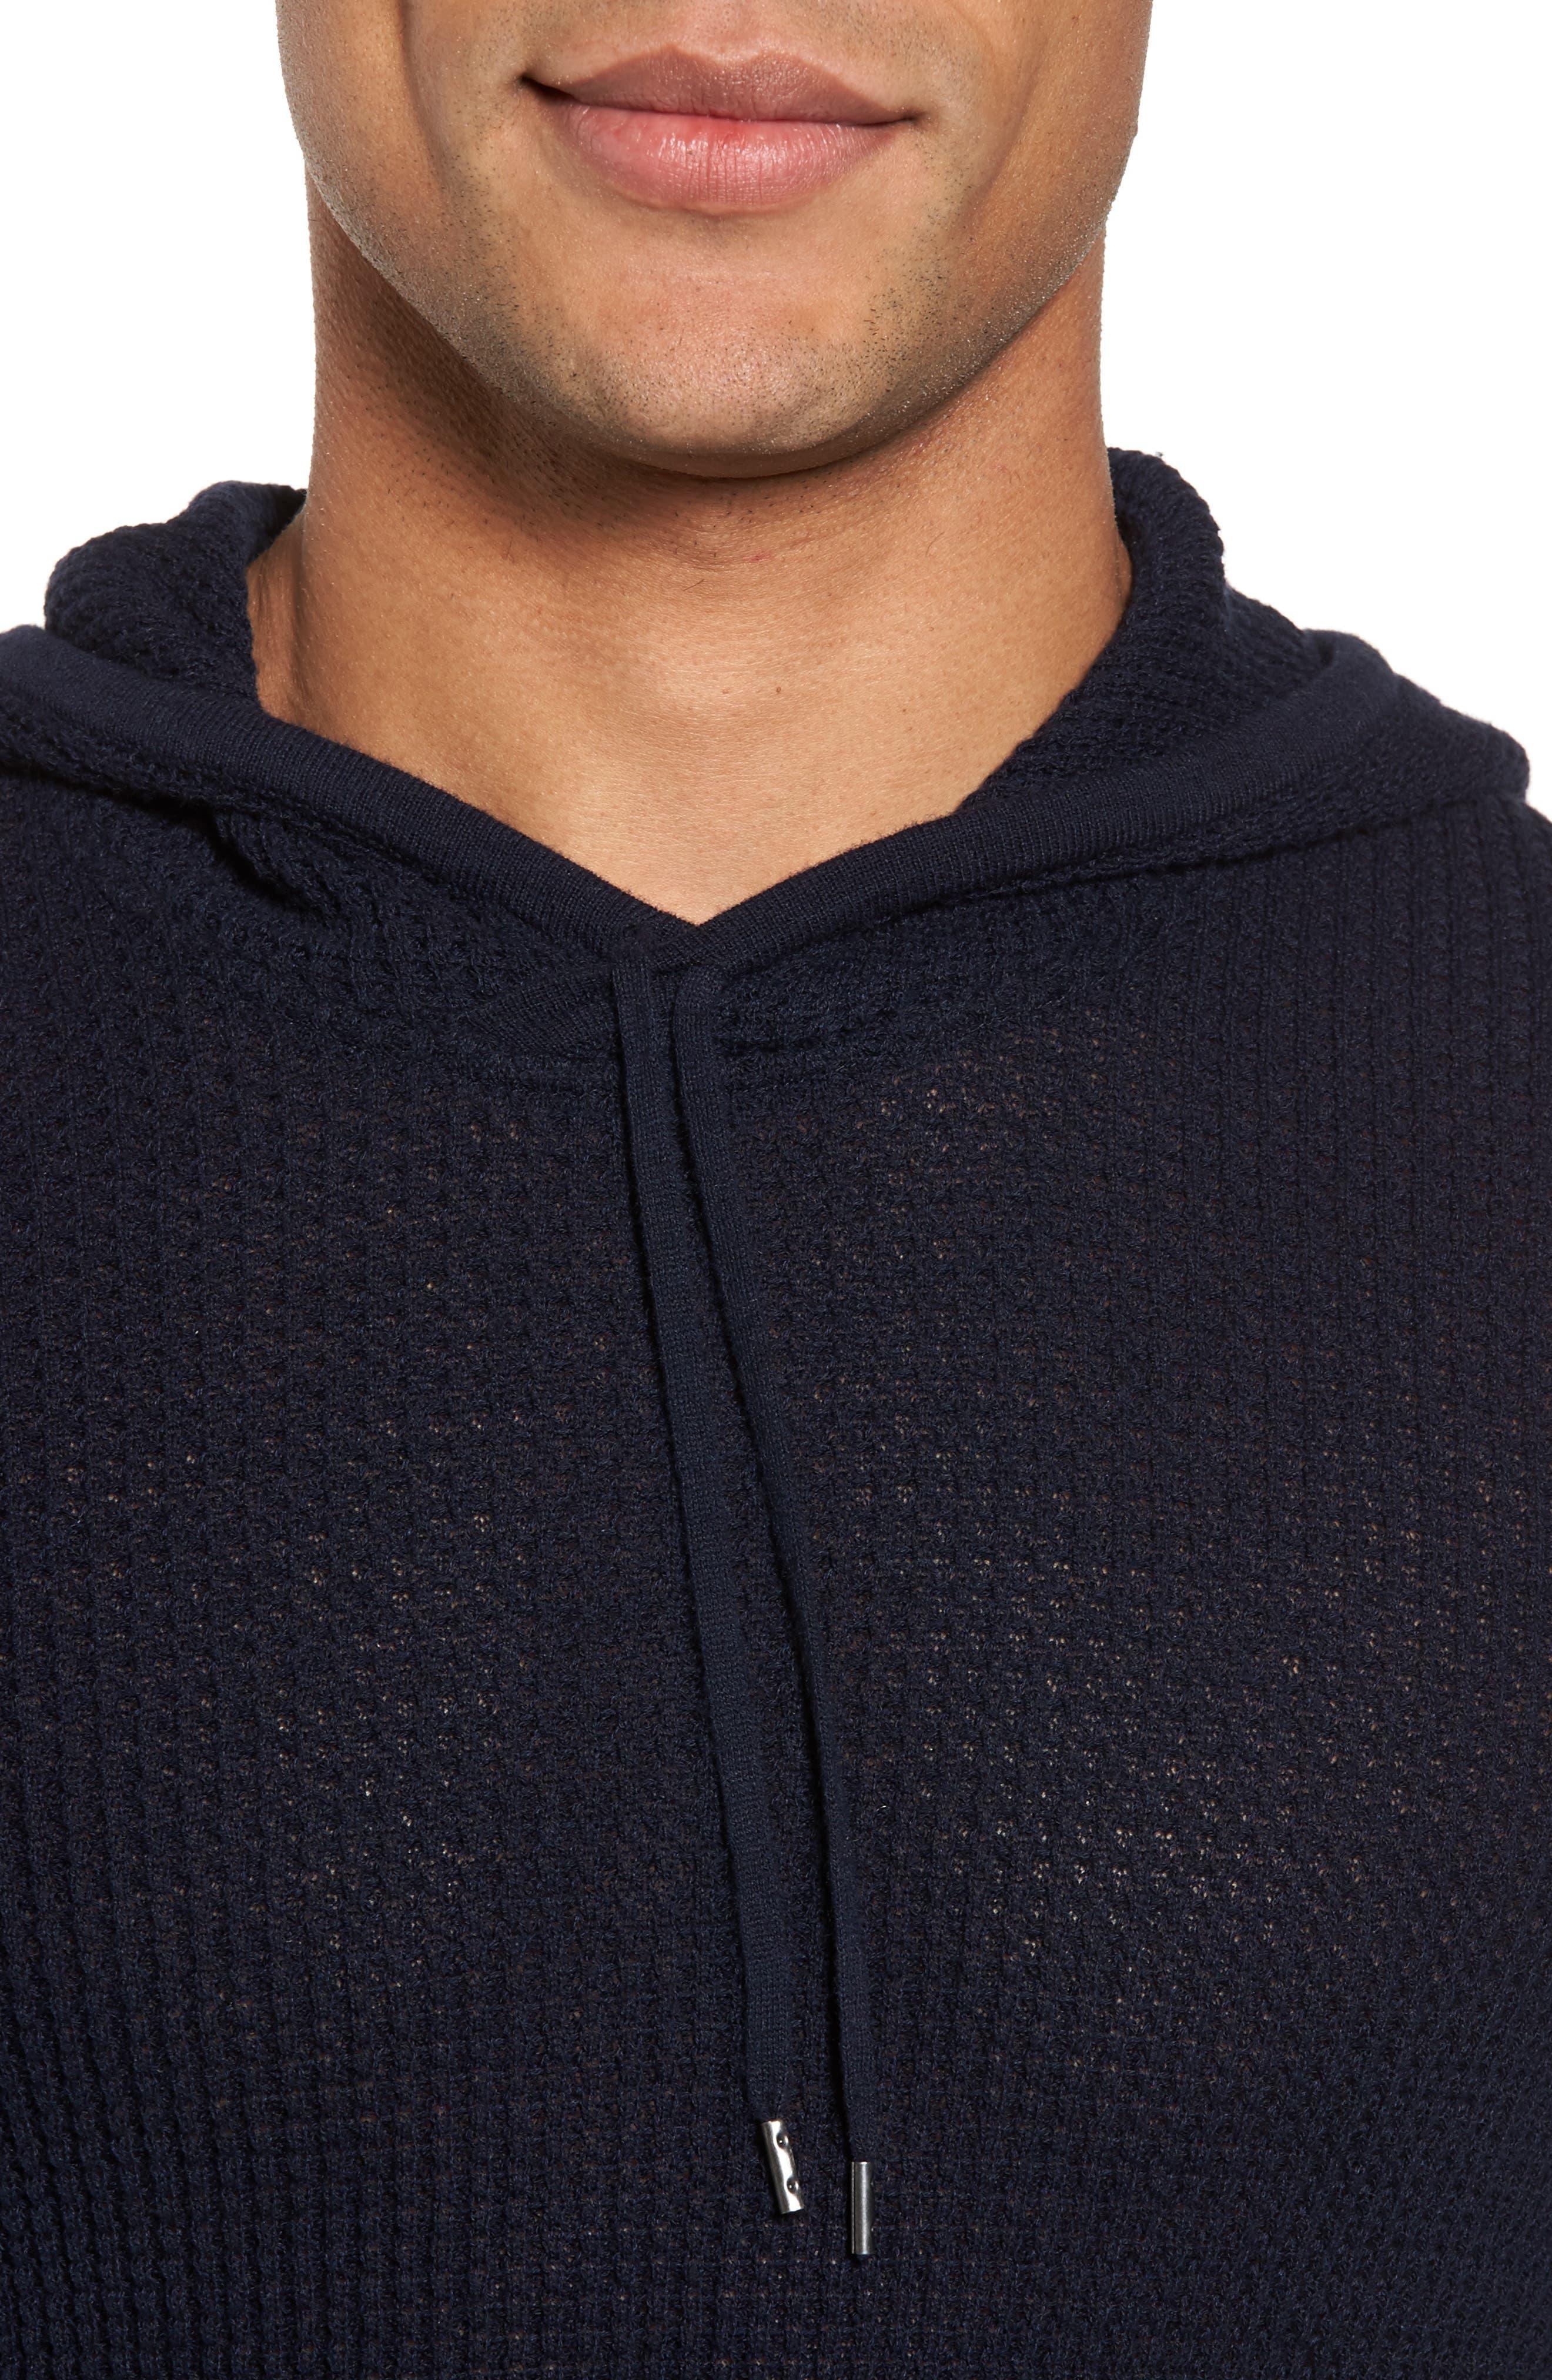 Thermal Pullover Hoodie,                             Alternate thumbnail 4, color,                             Marine